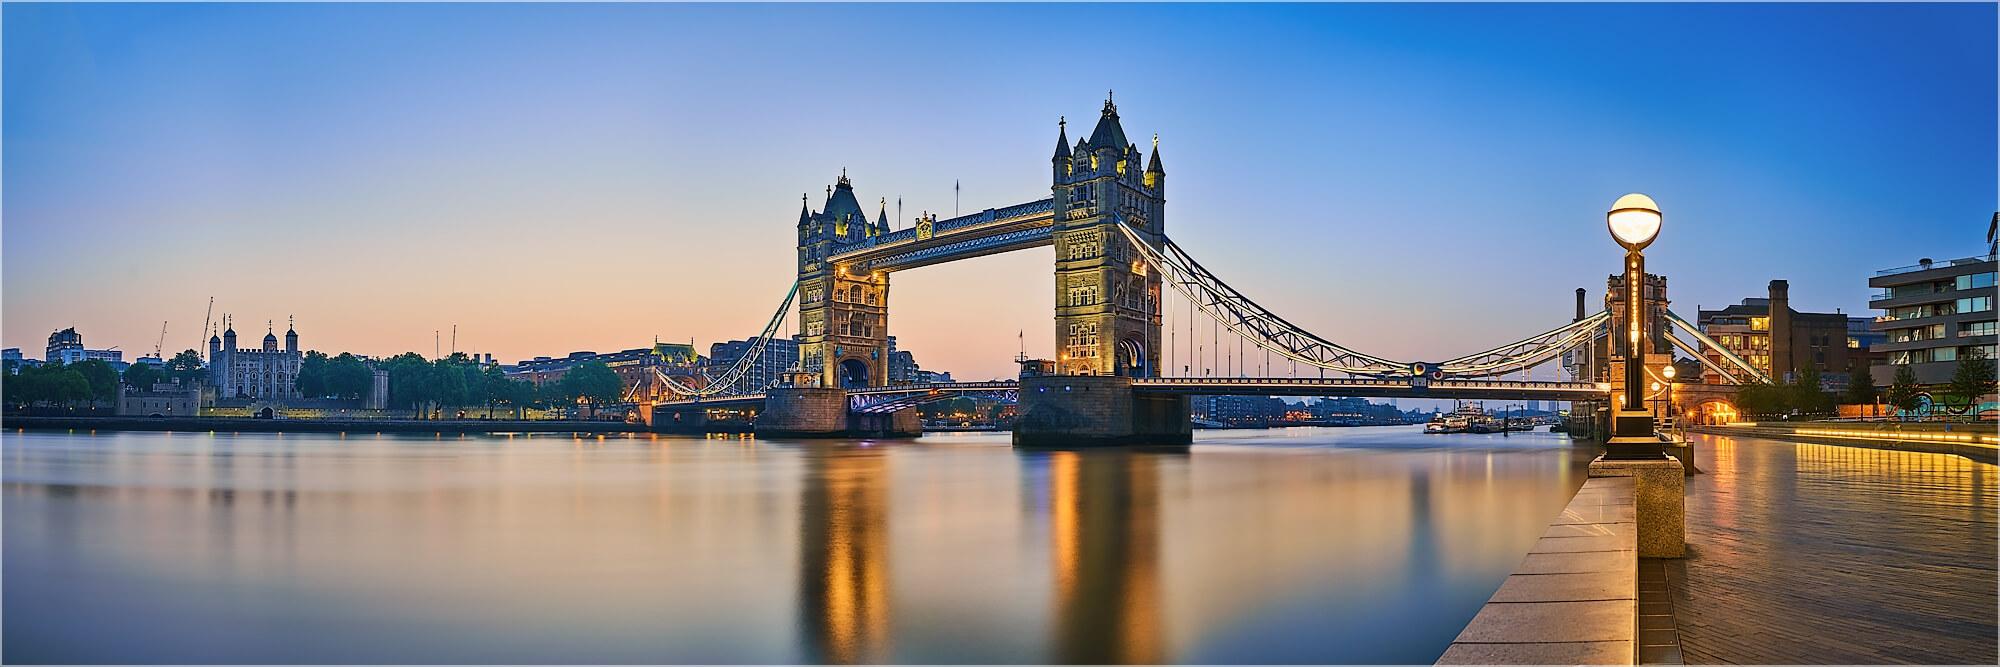 Panoramabild morgens an der Tower Bridge London